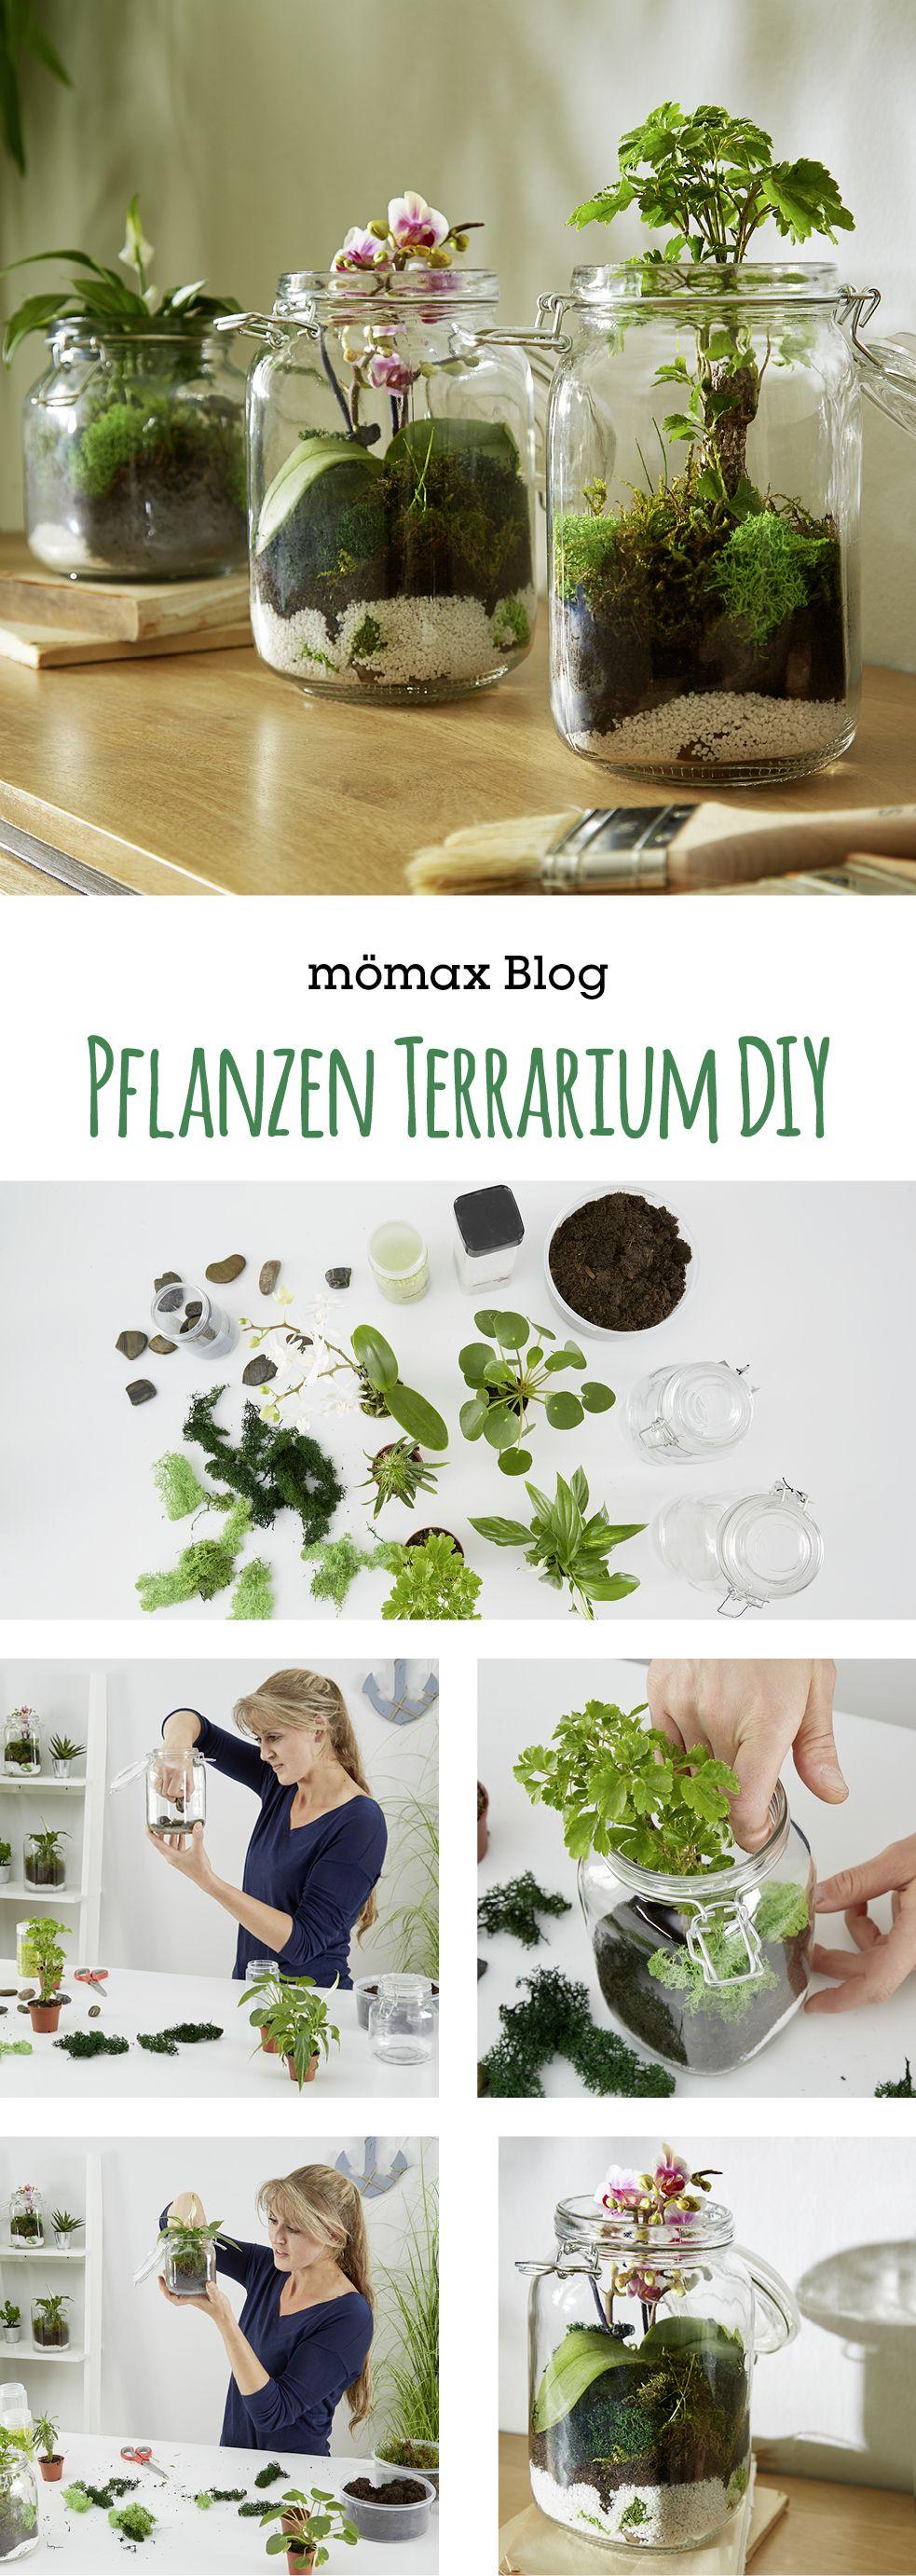 Photo of Make your own plant terrarium